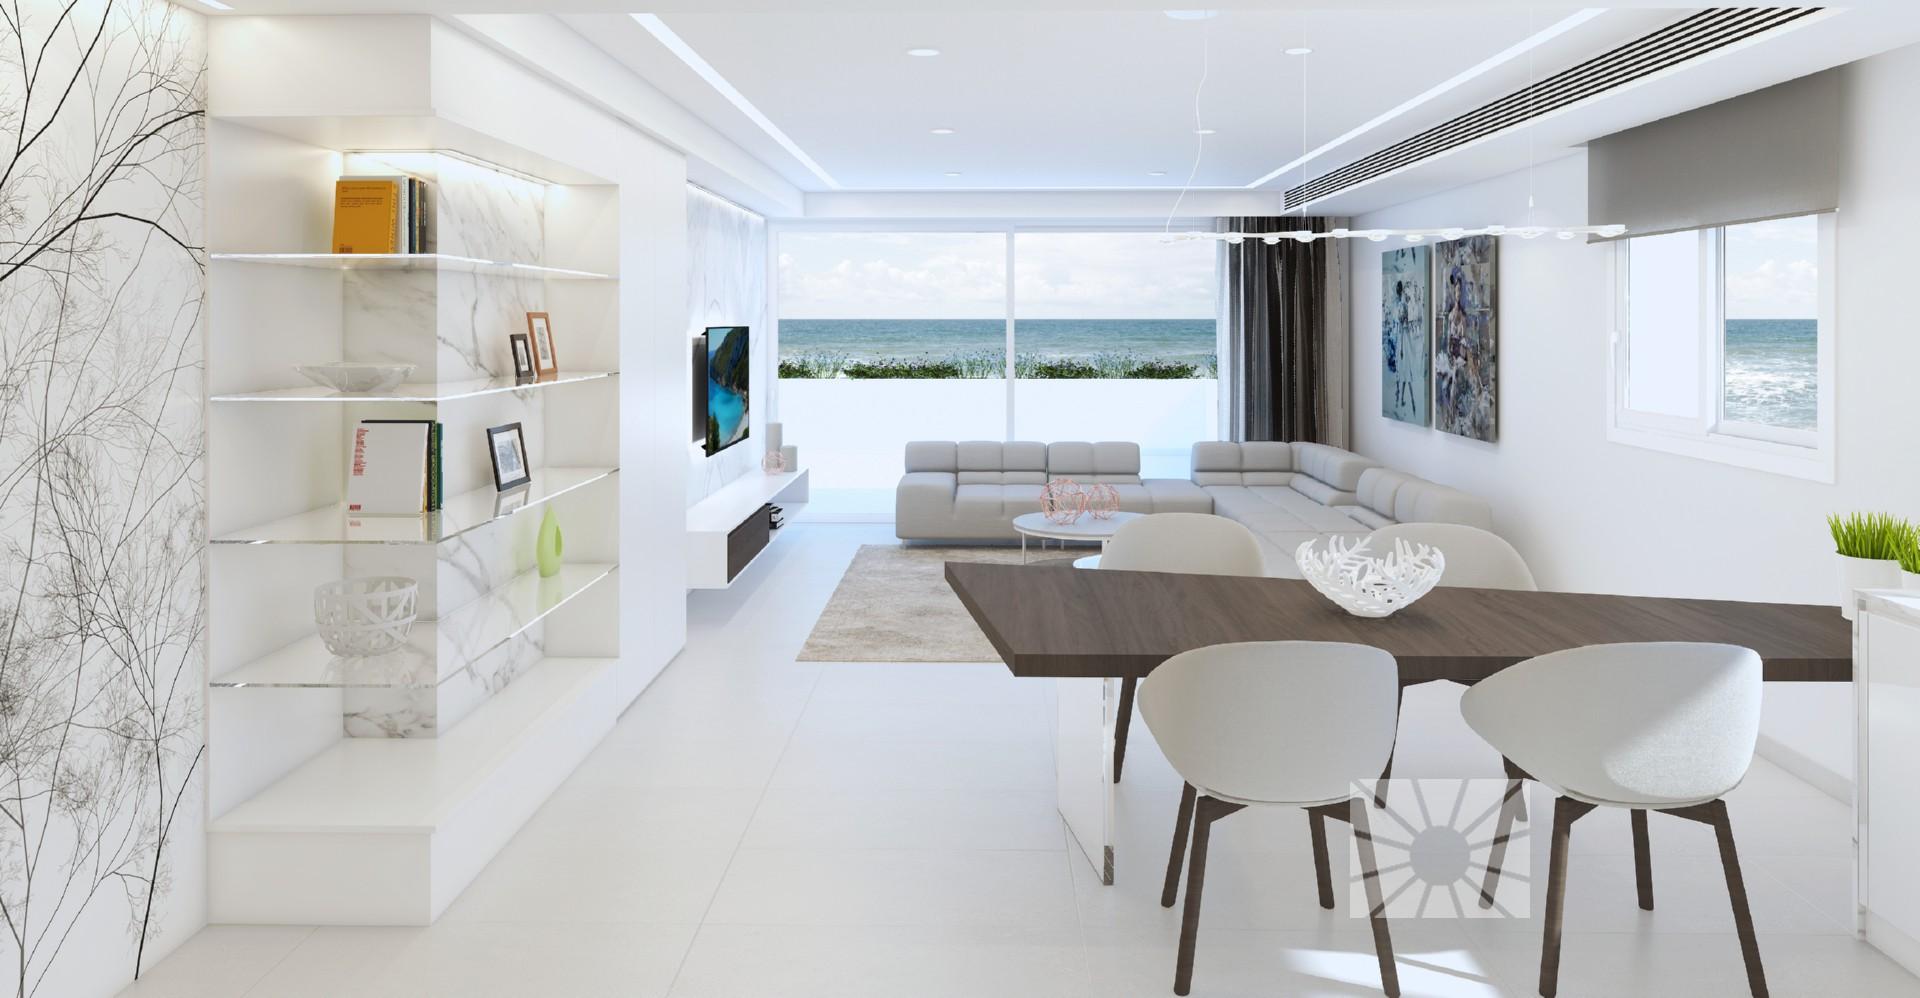 Blue Infinity Cumbre Del Sol Benitachell Luxury Apartment